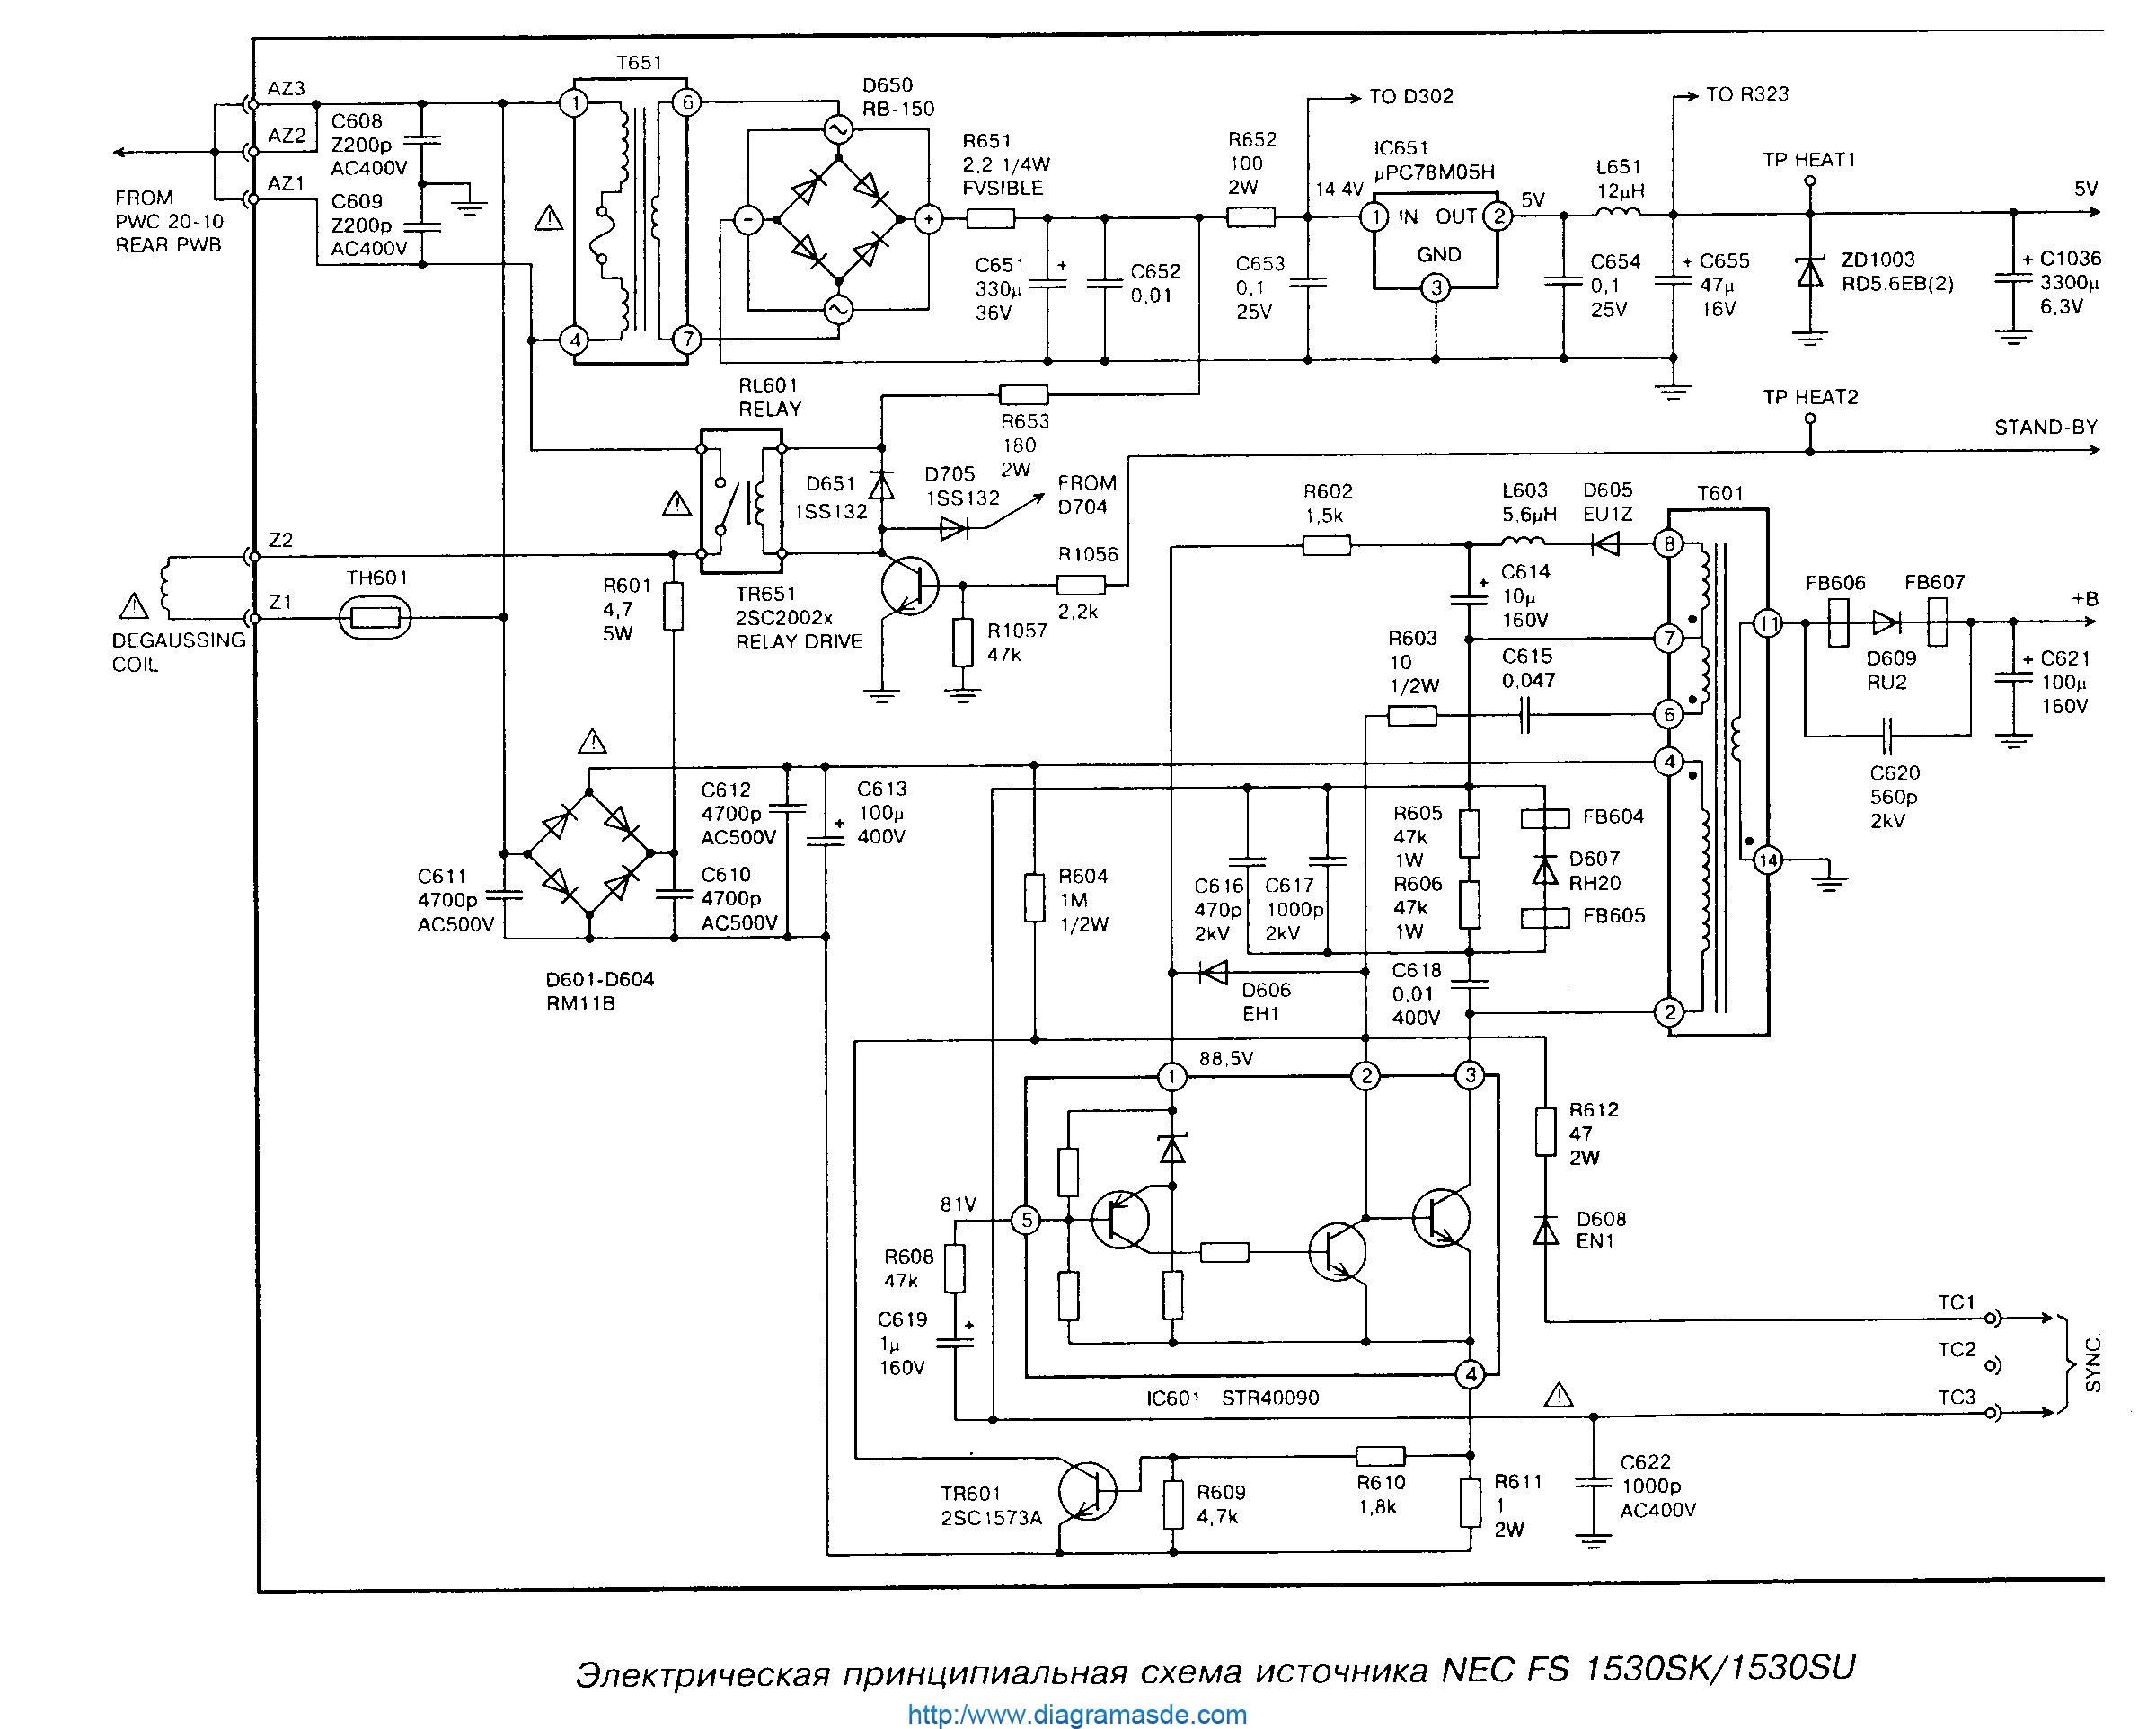 Схема телевизора rainford tvf-5584